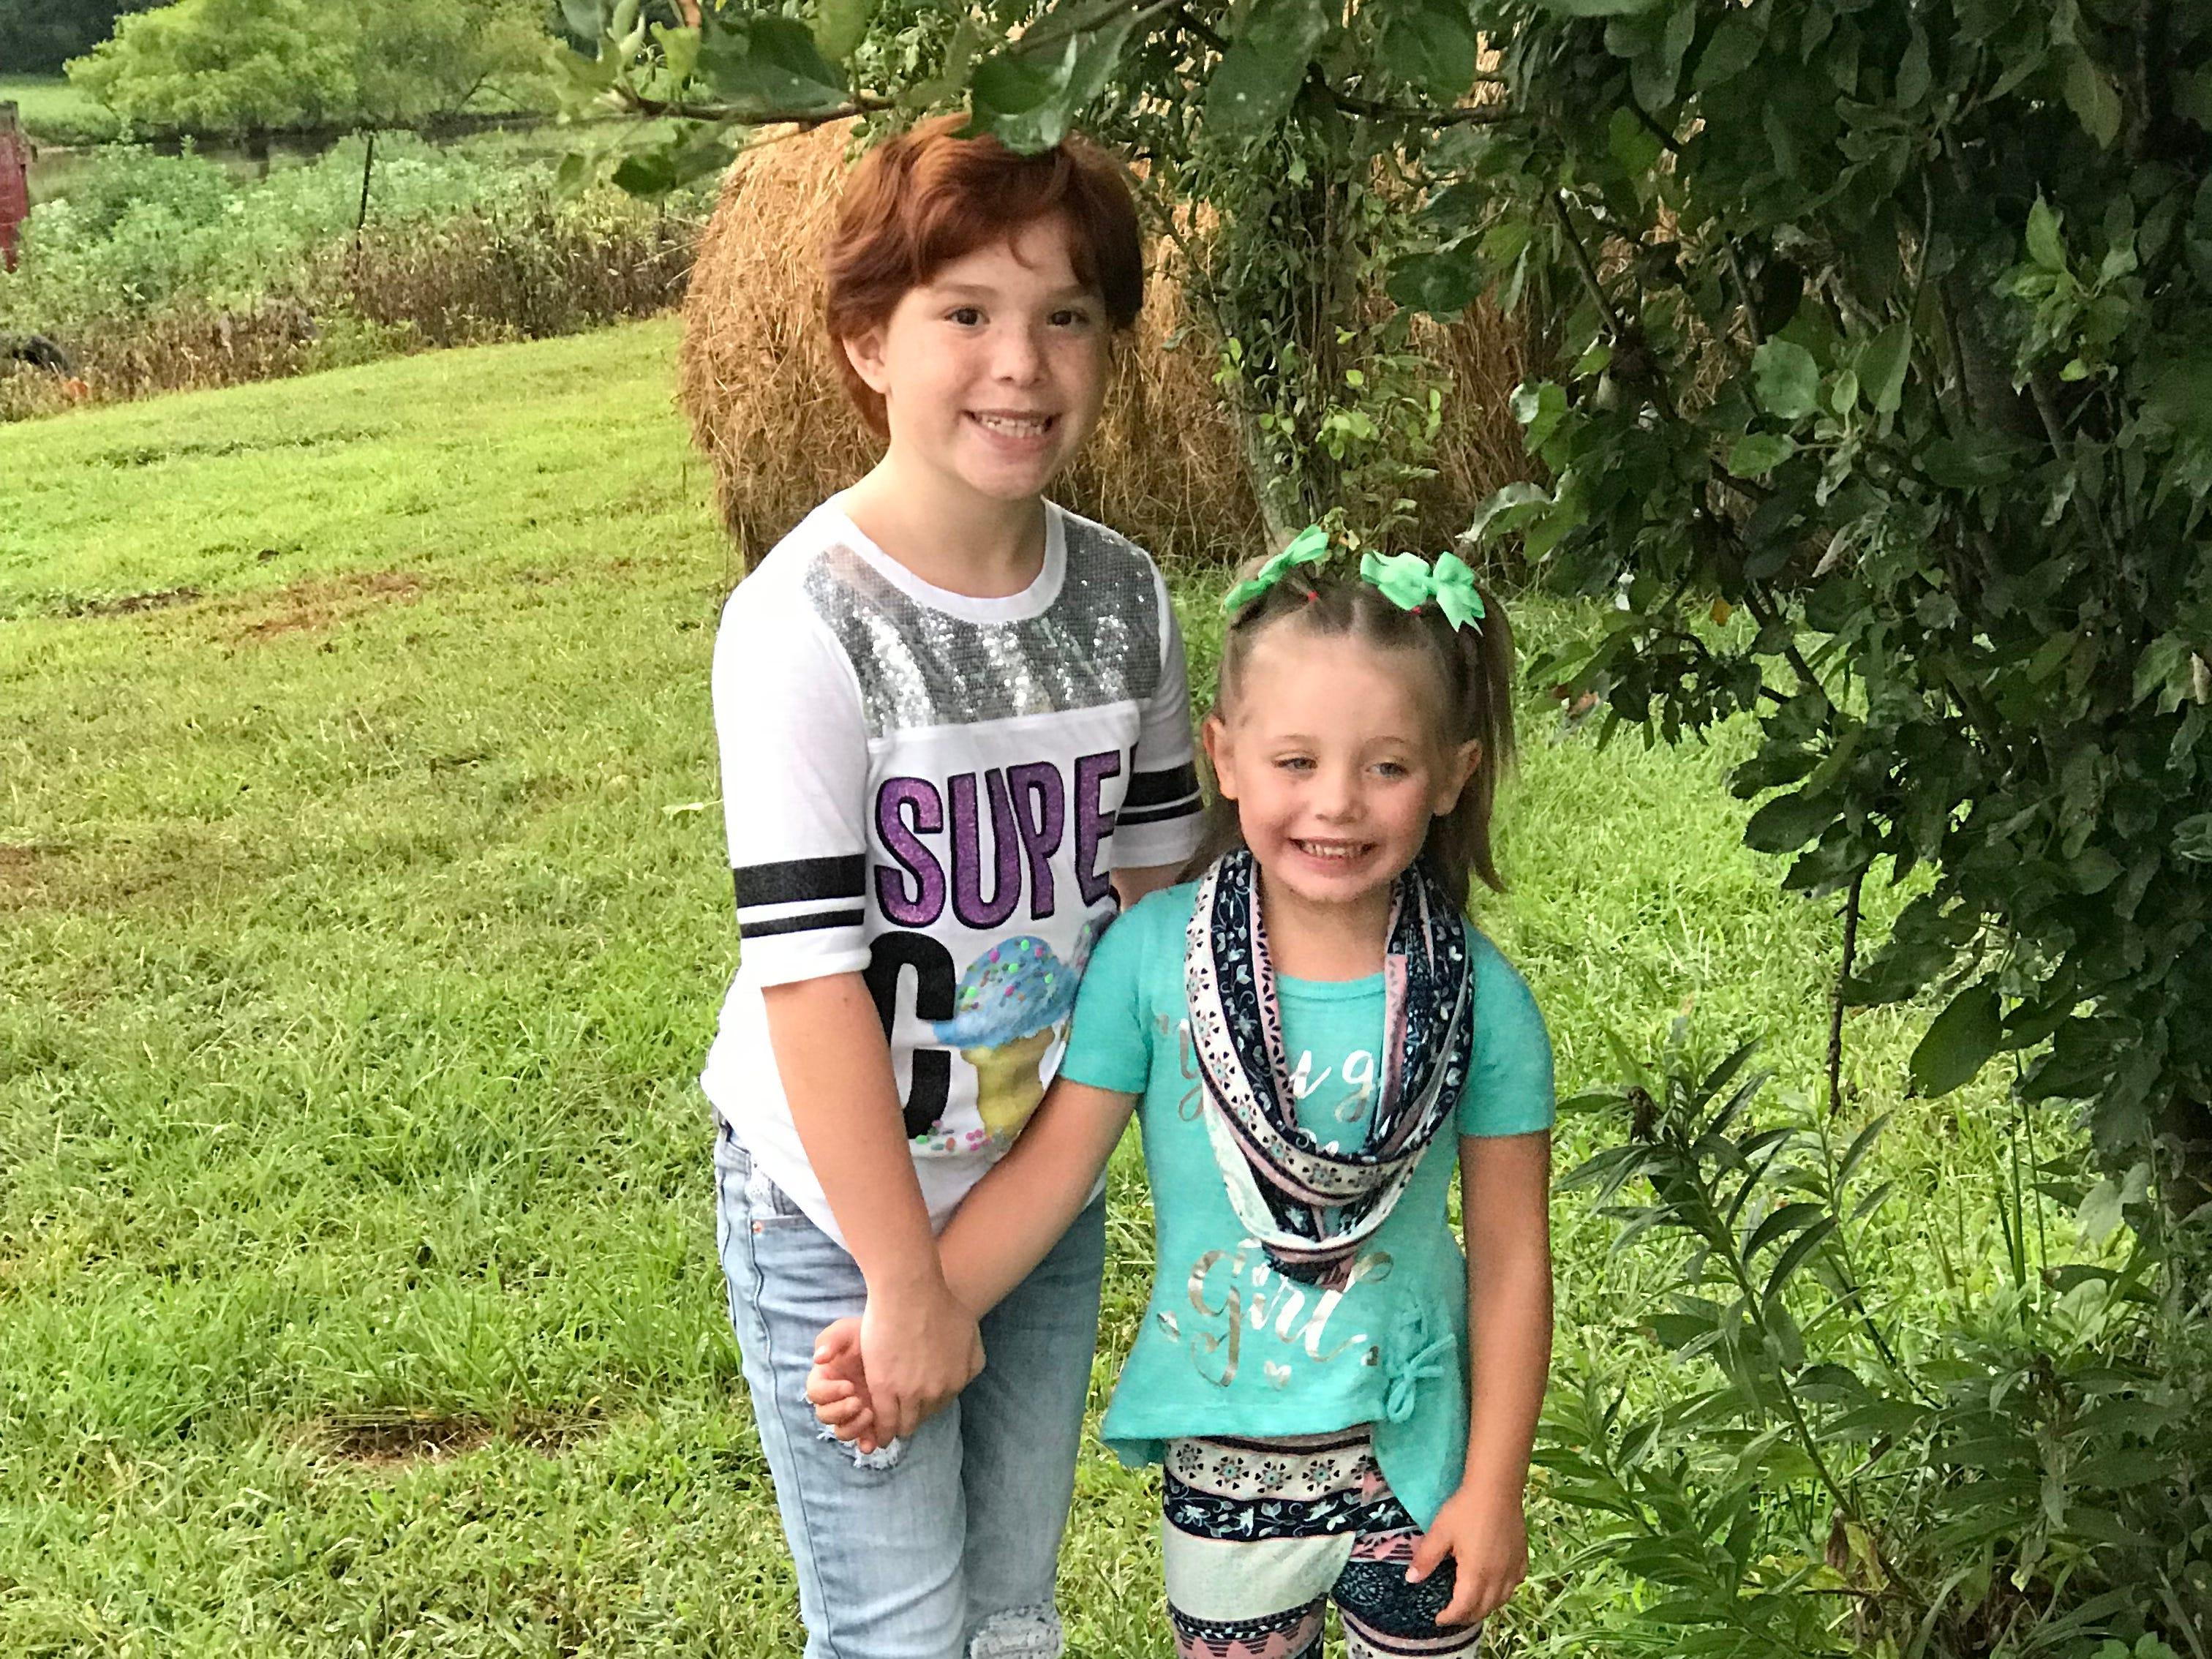 Abbie kindergarten; Aiden kindergarten; Adrianna 4th grade; Andrew 3rd grade